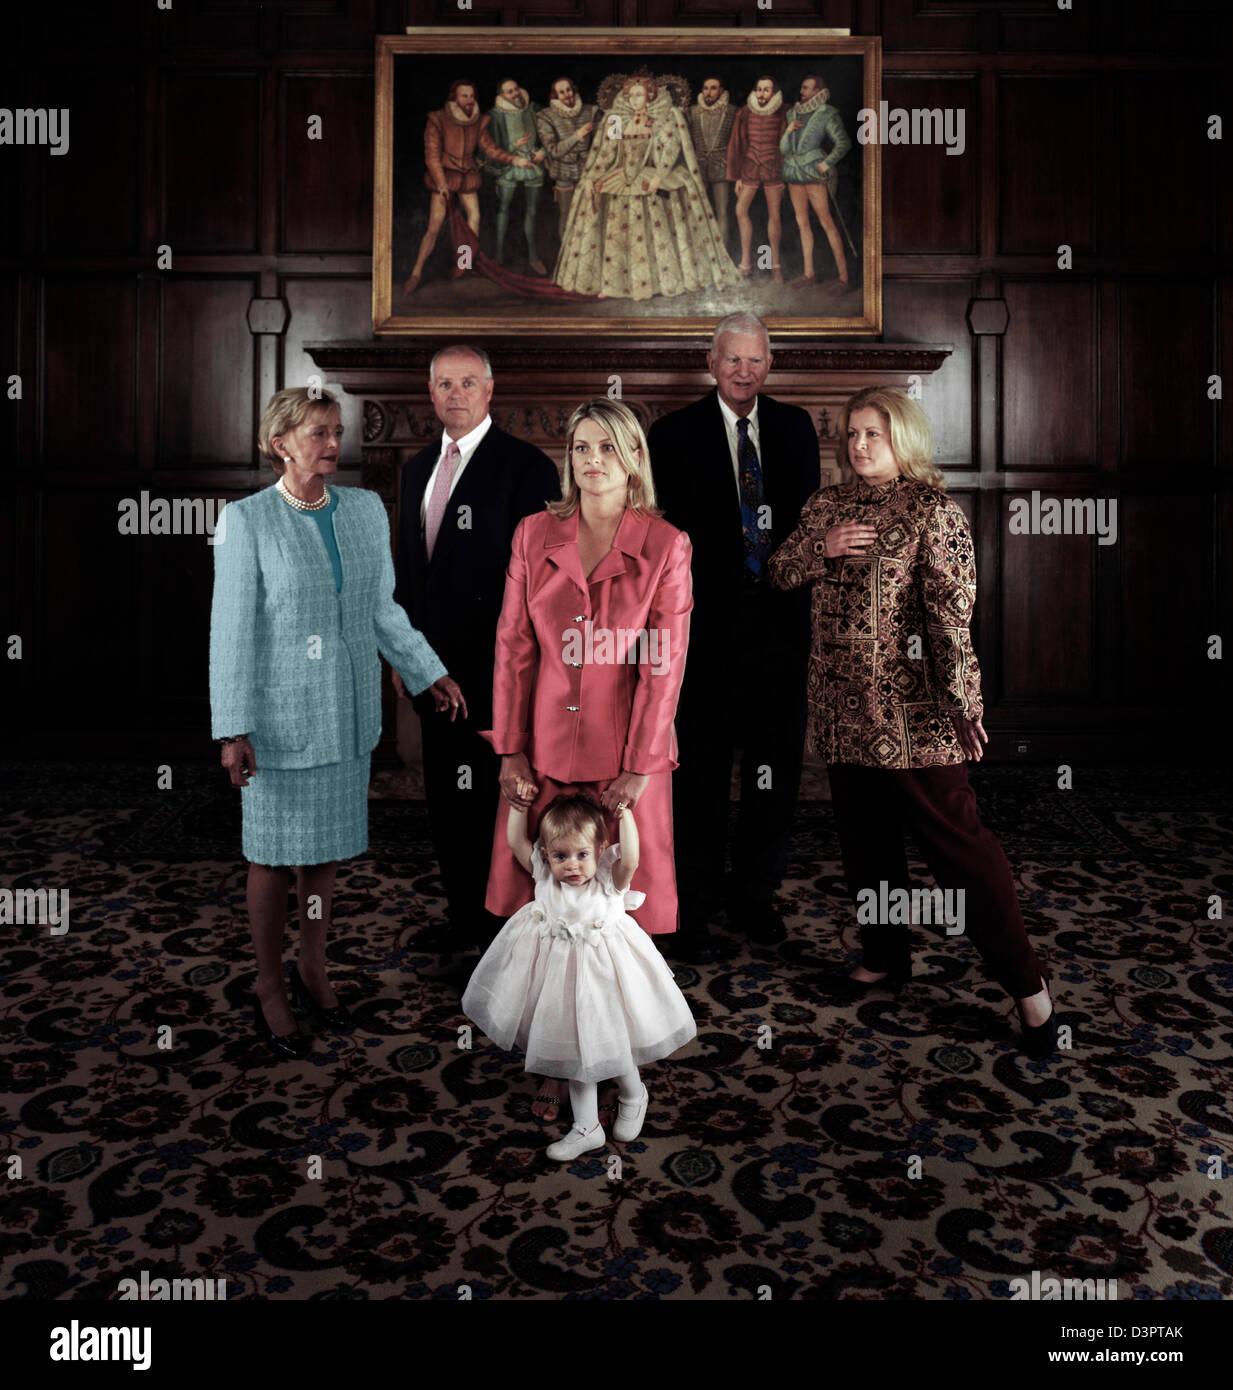 Big Family - Stock Image